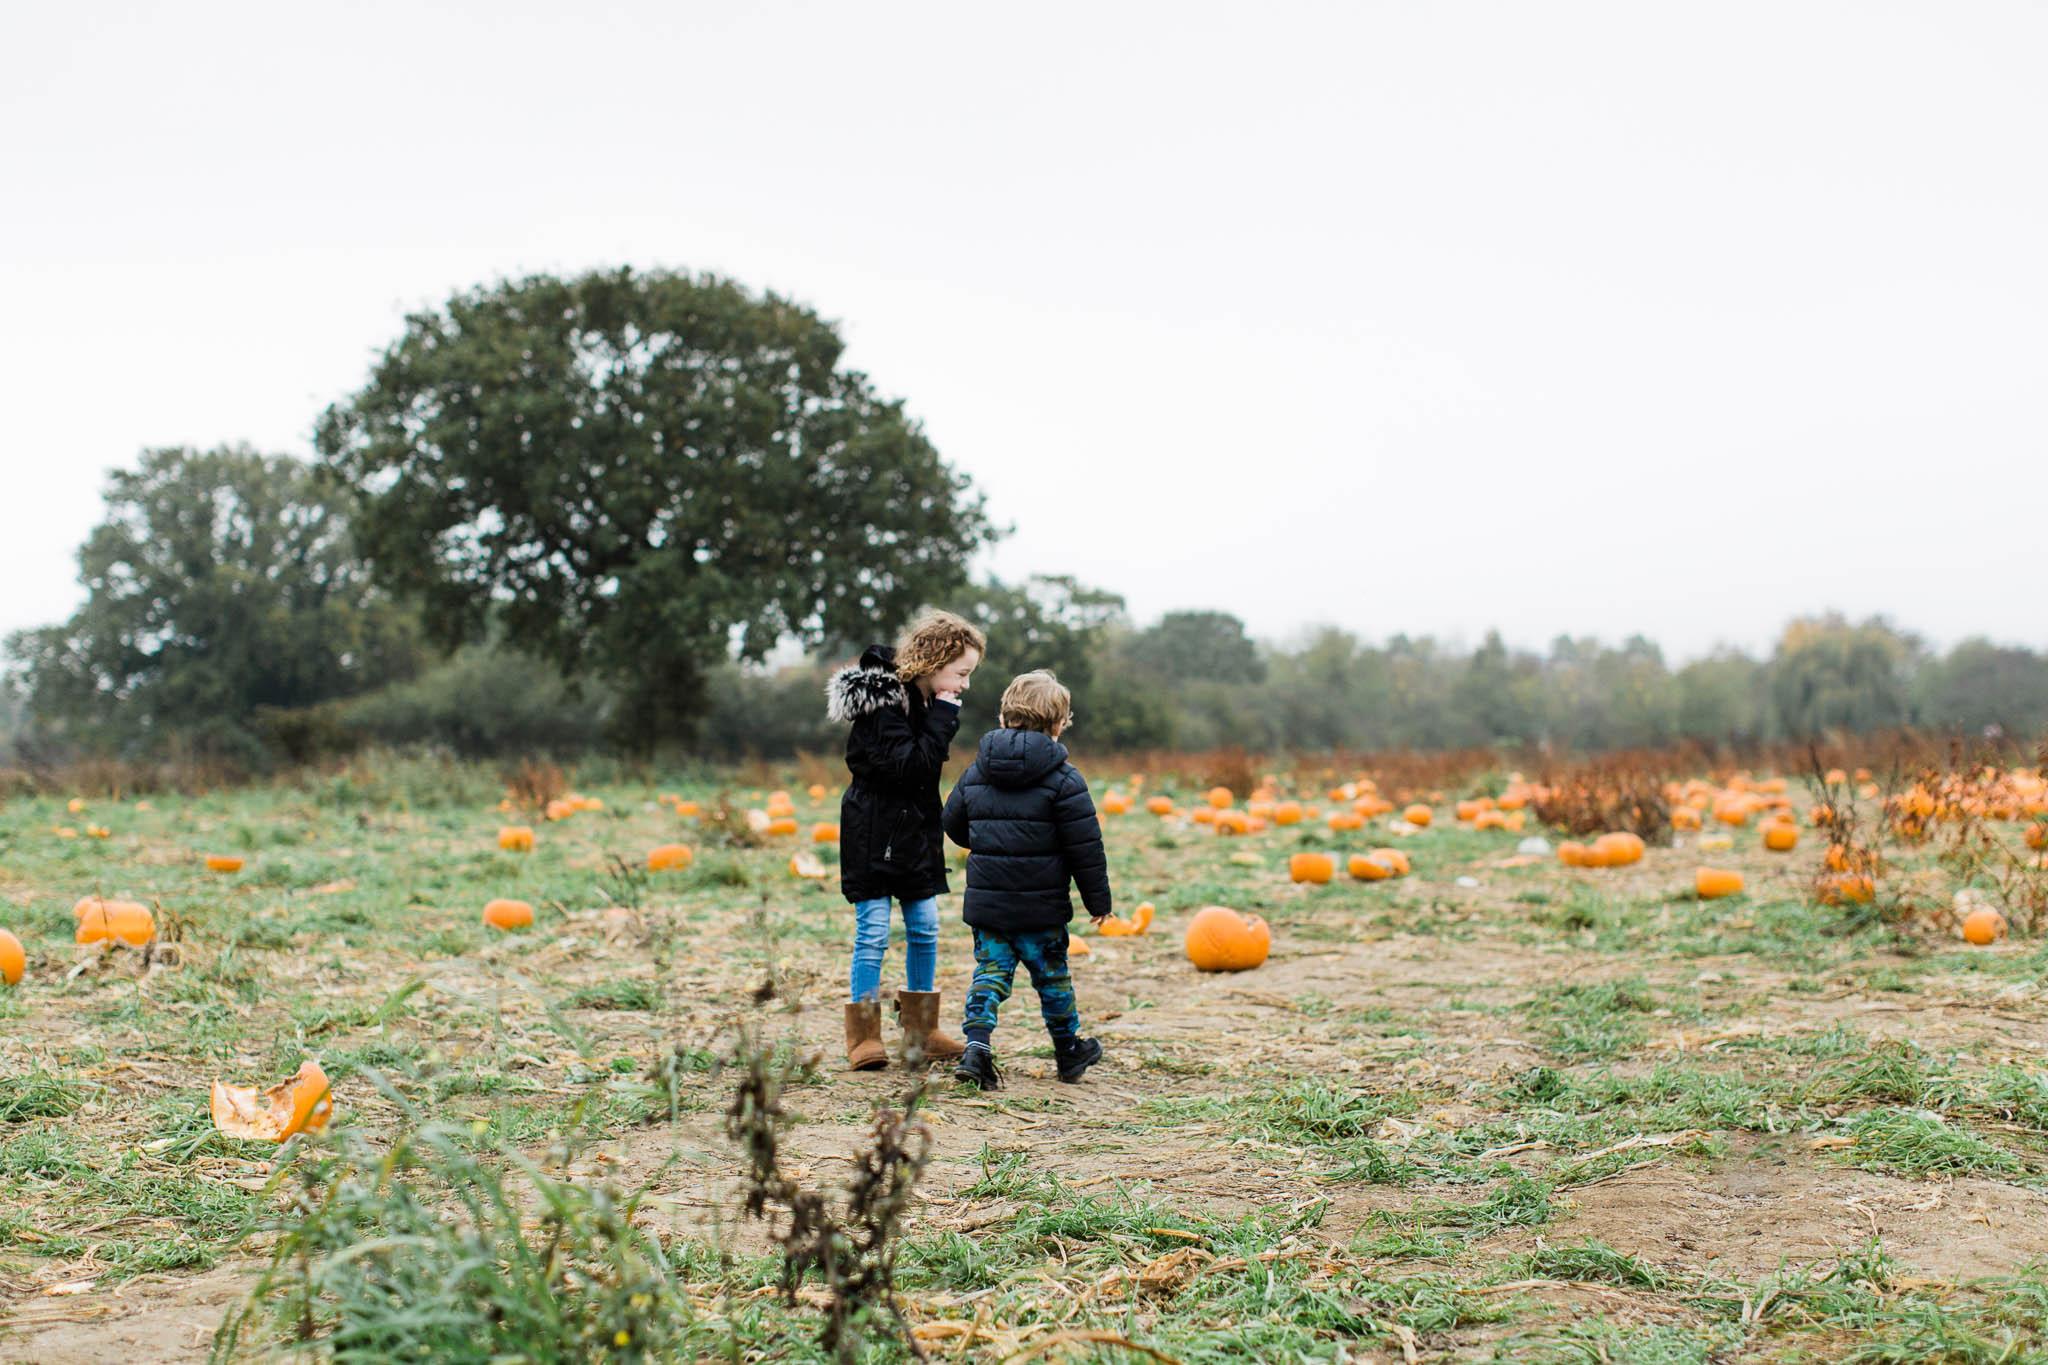 brother and sister walking through pumpkin farm